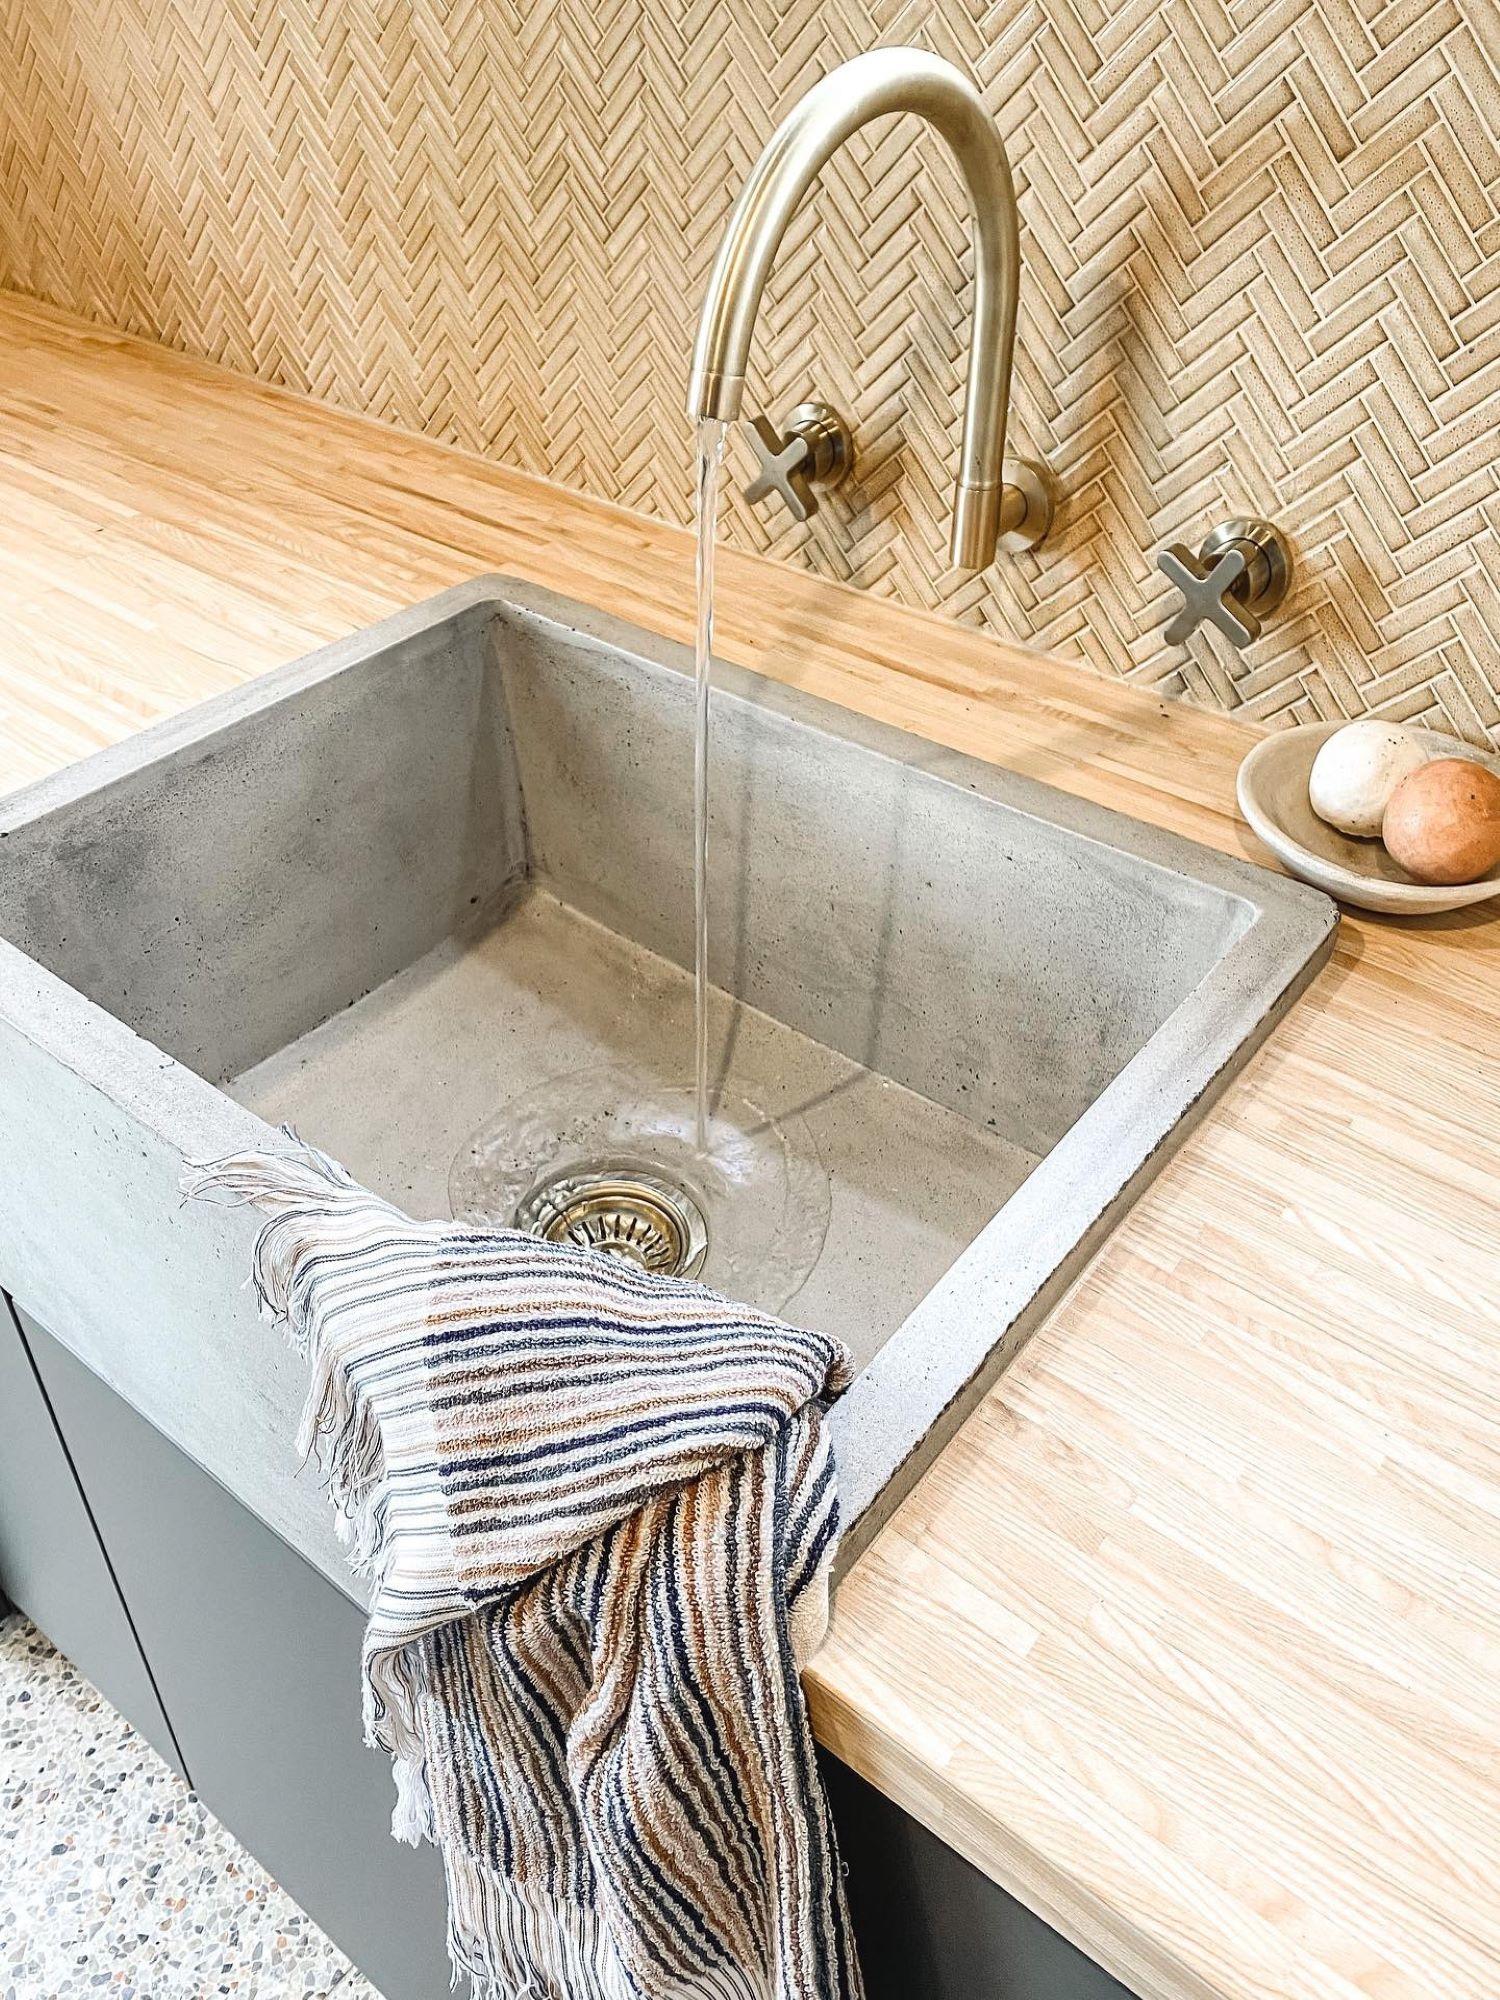 raydan-blair-interior-design-styling-laundry-sink